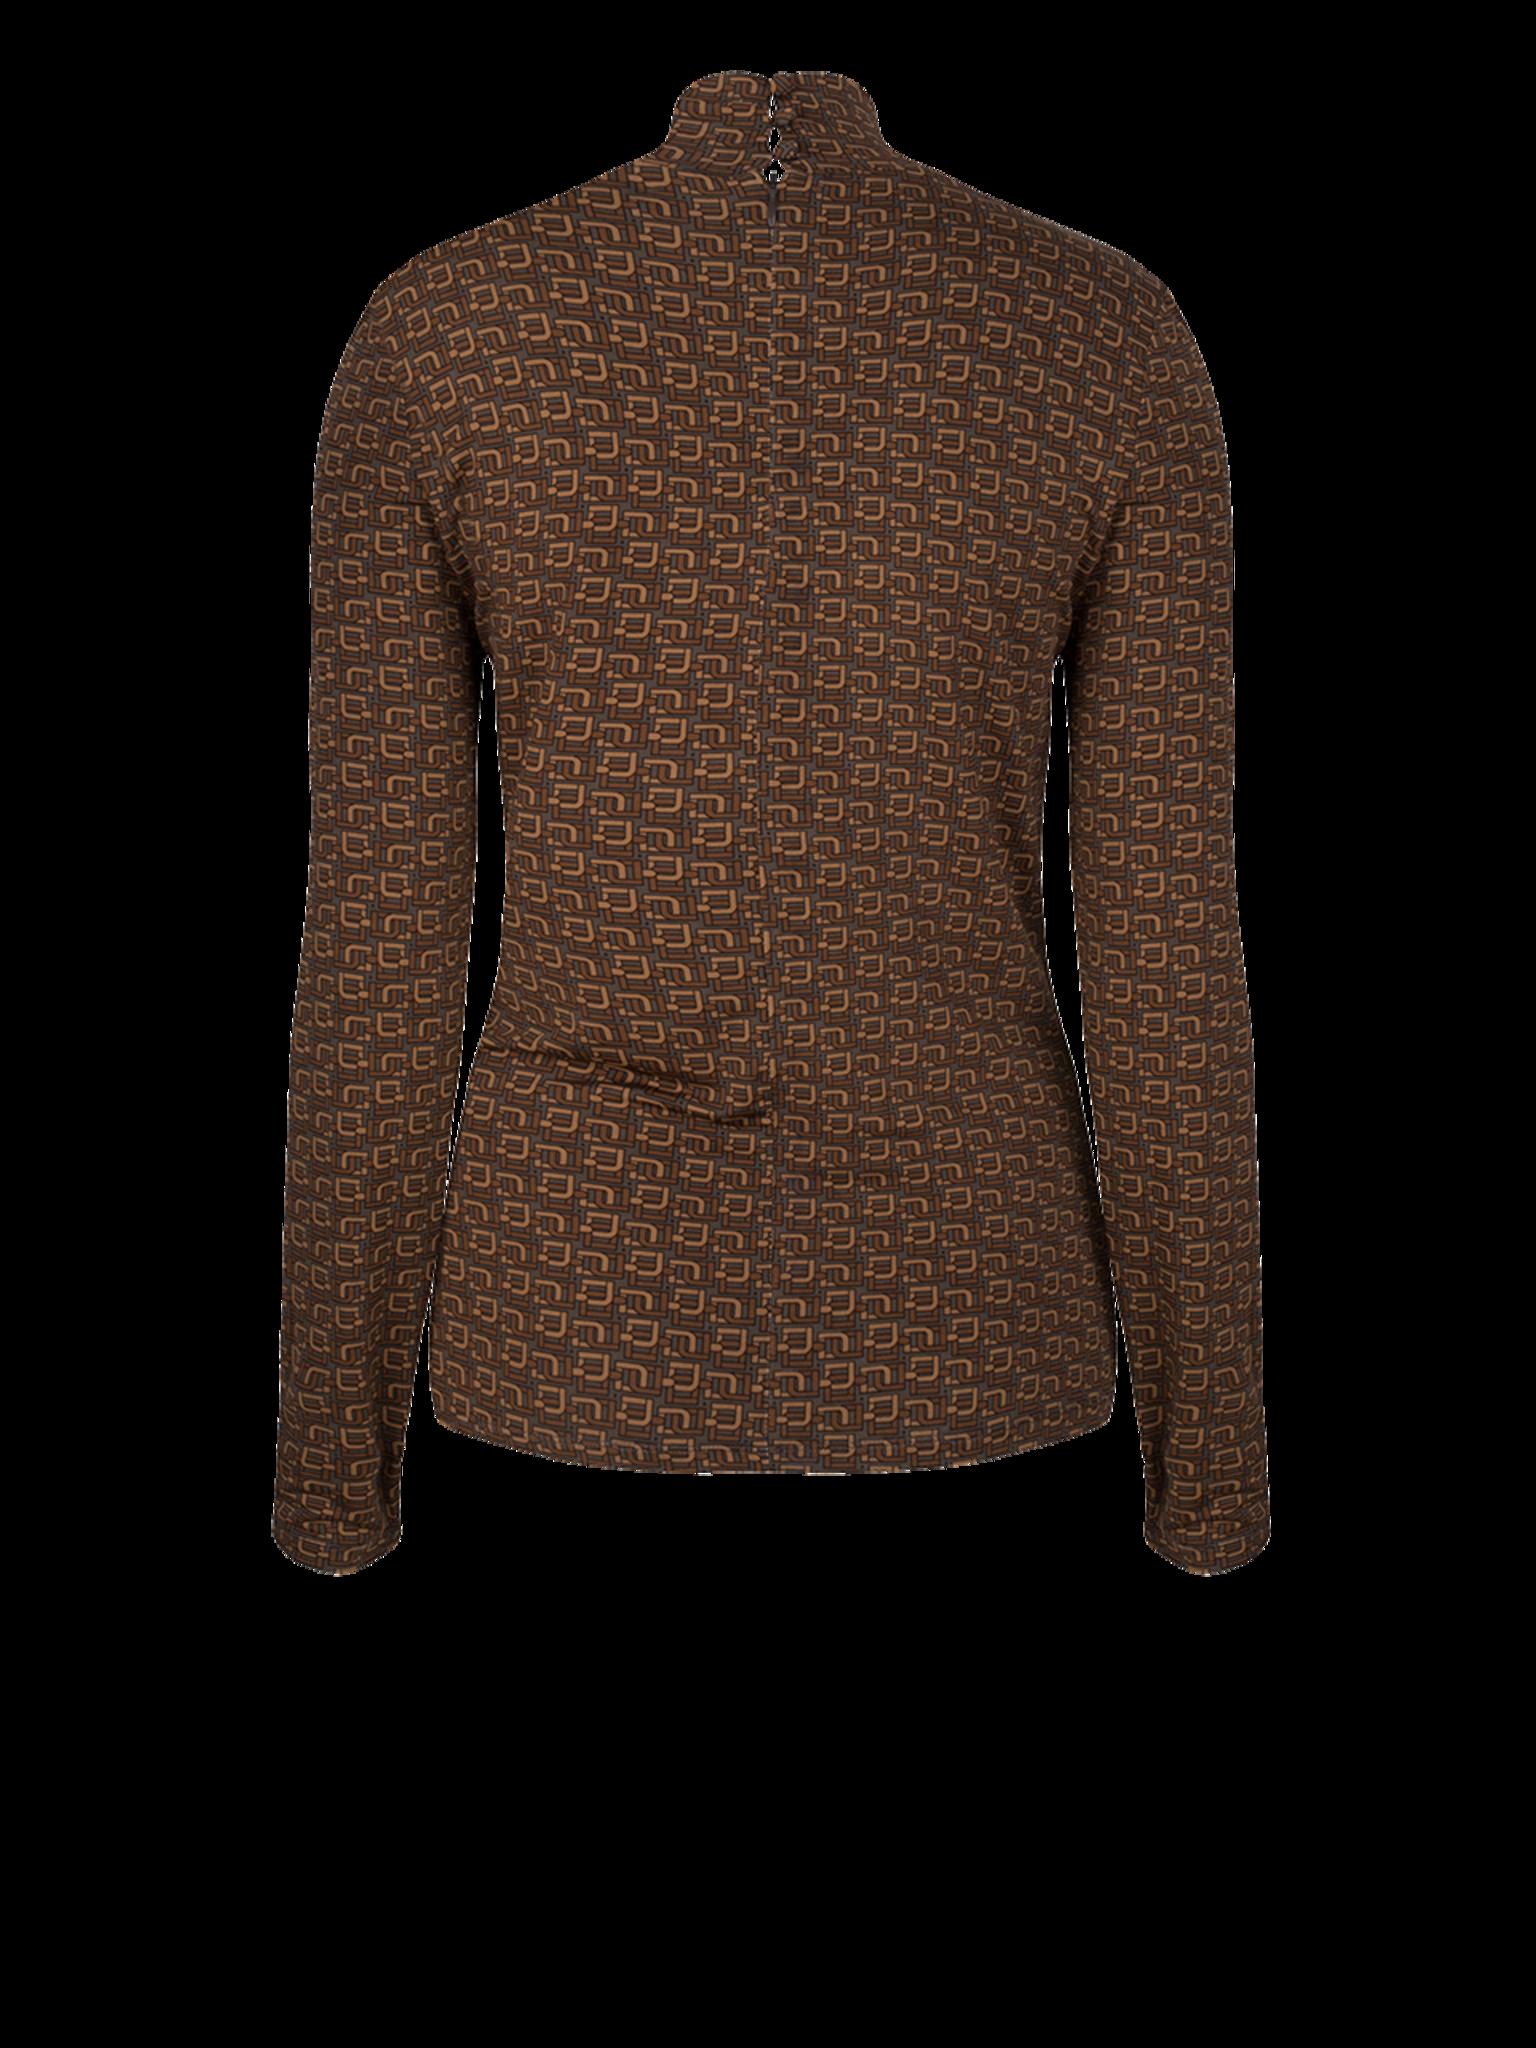 Dante 6 sweater 204607 ELVIS-2